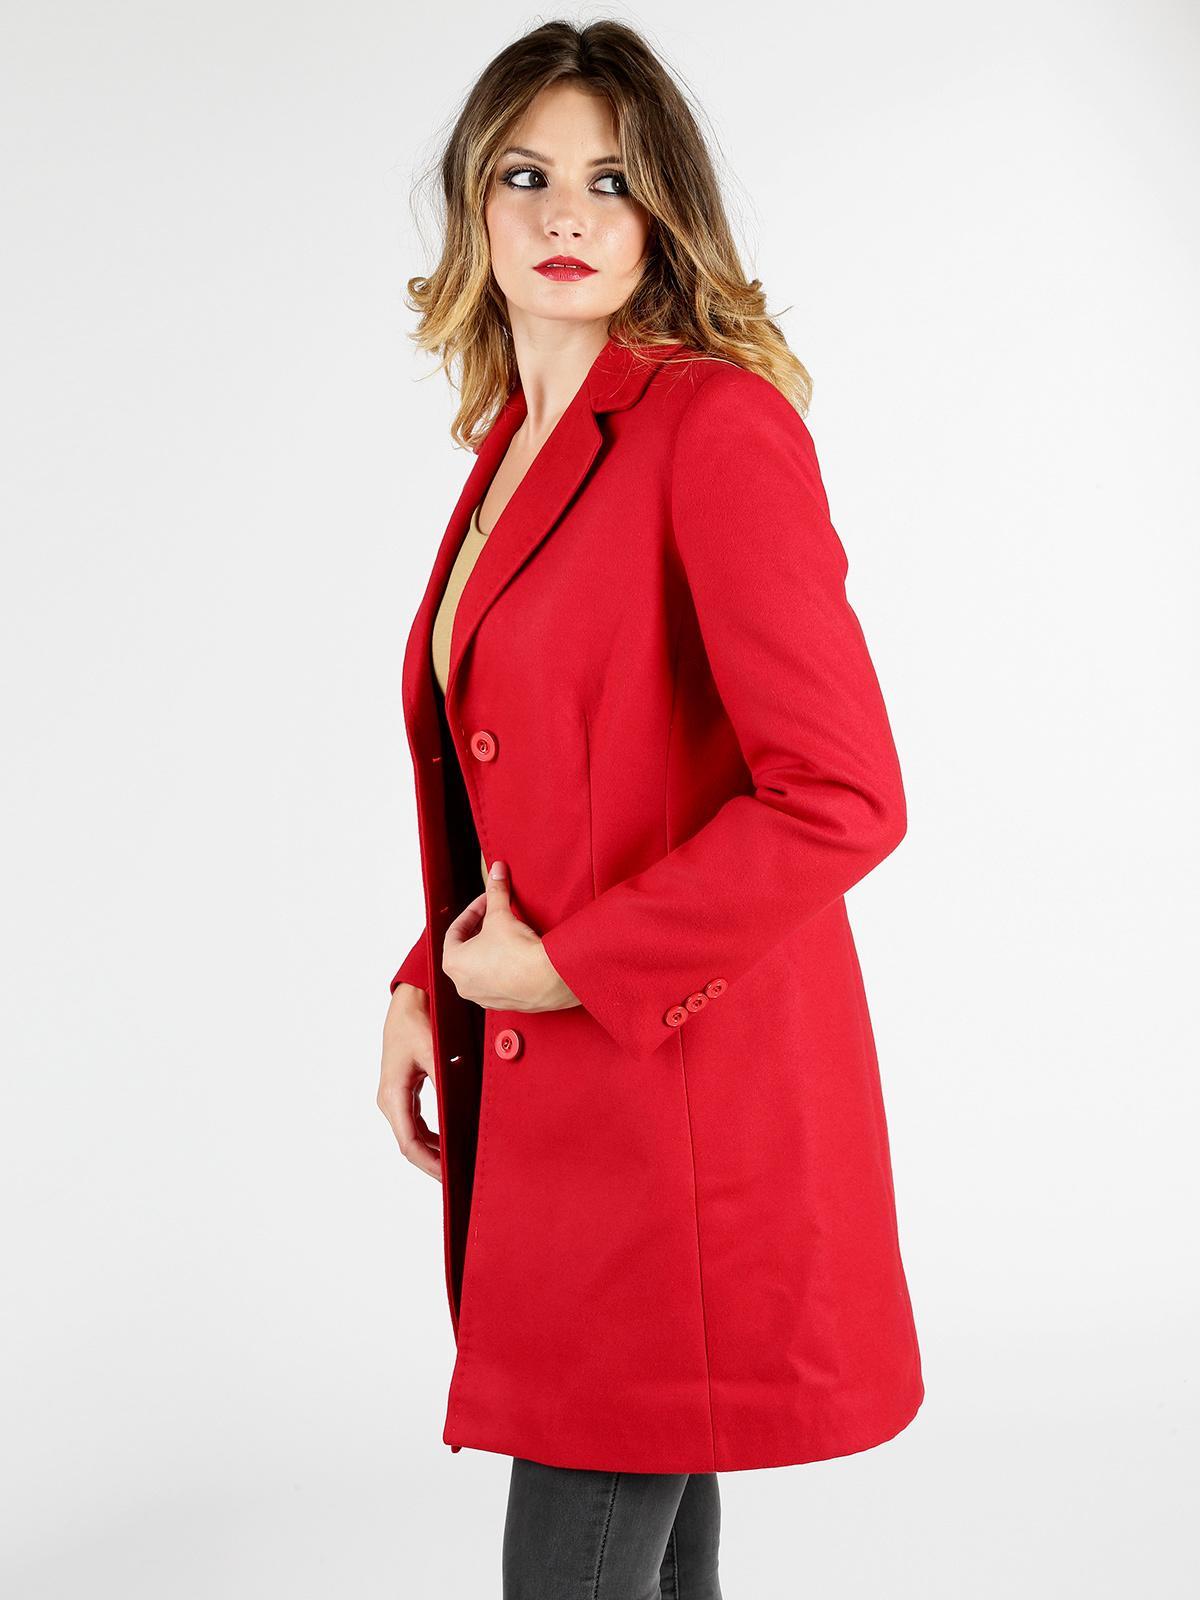 Cappotto rosso donna graffio | MecShopping